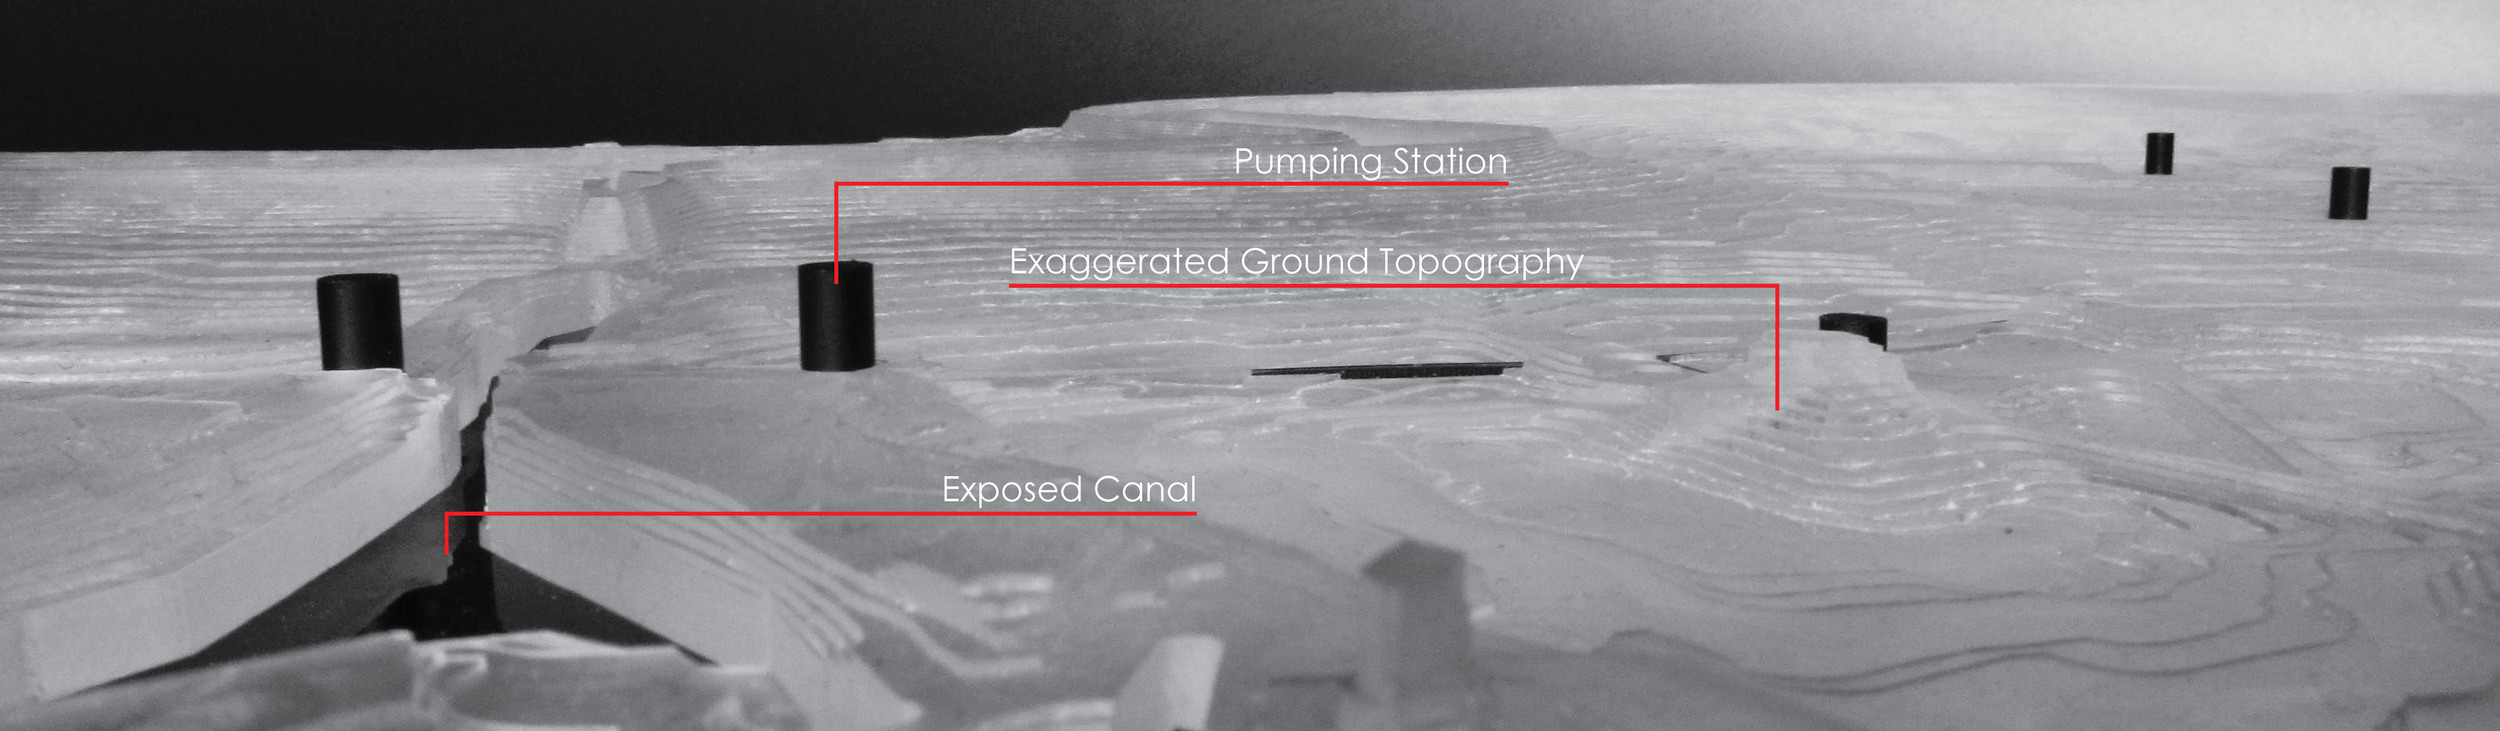 Pumping Station Diagram